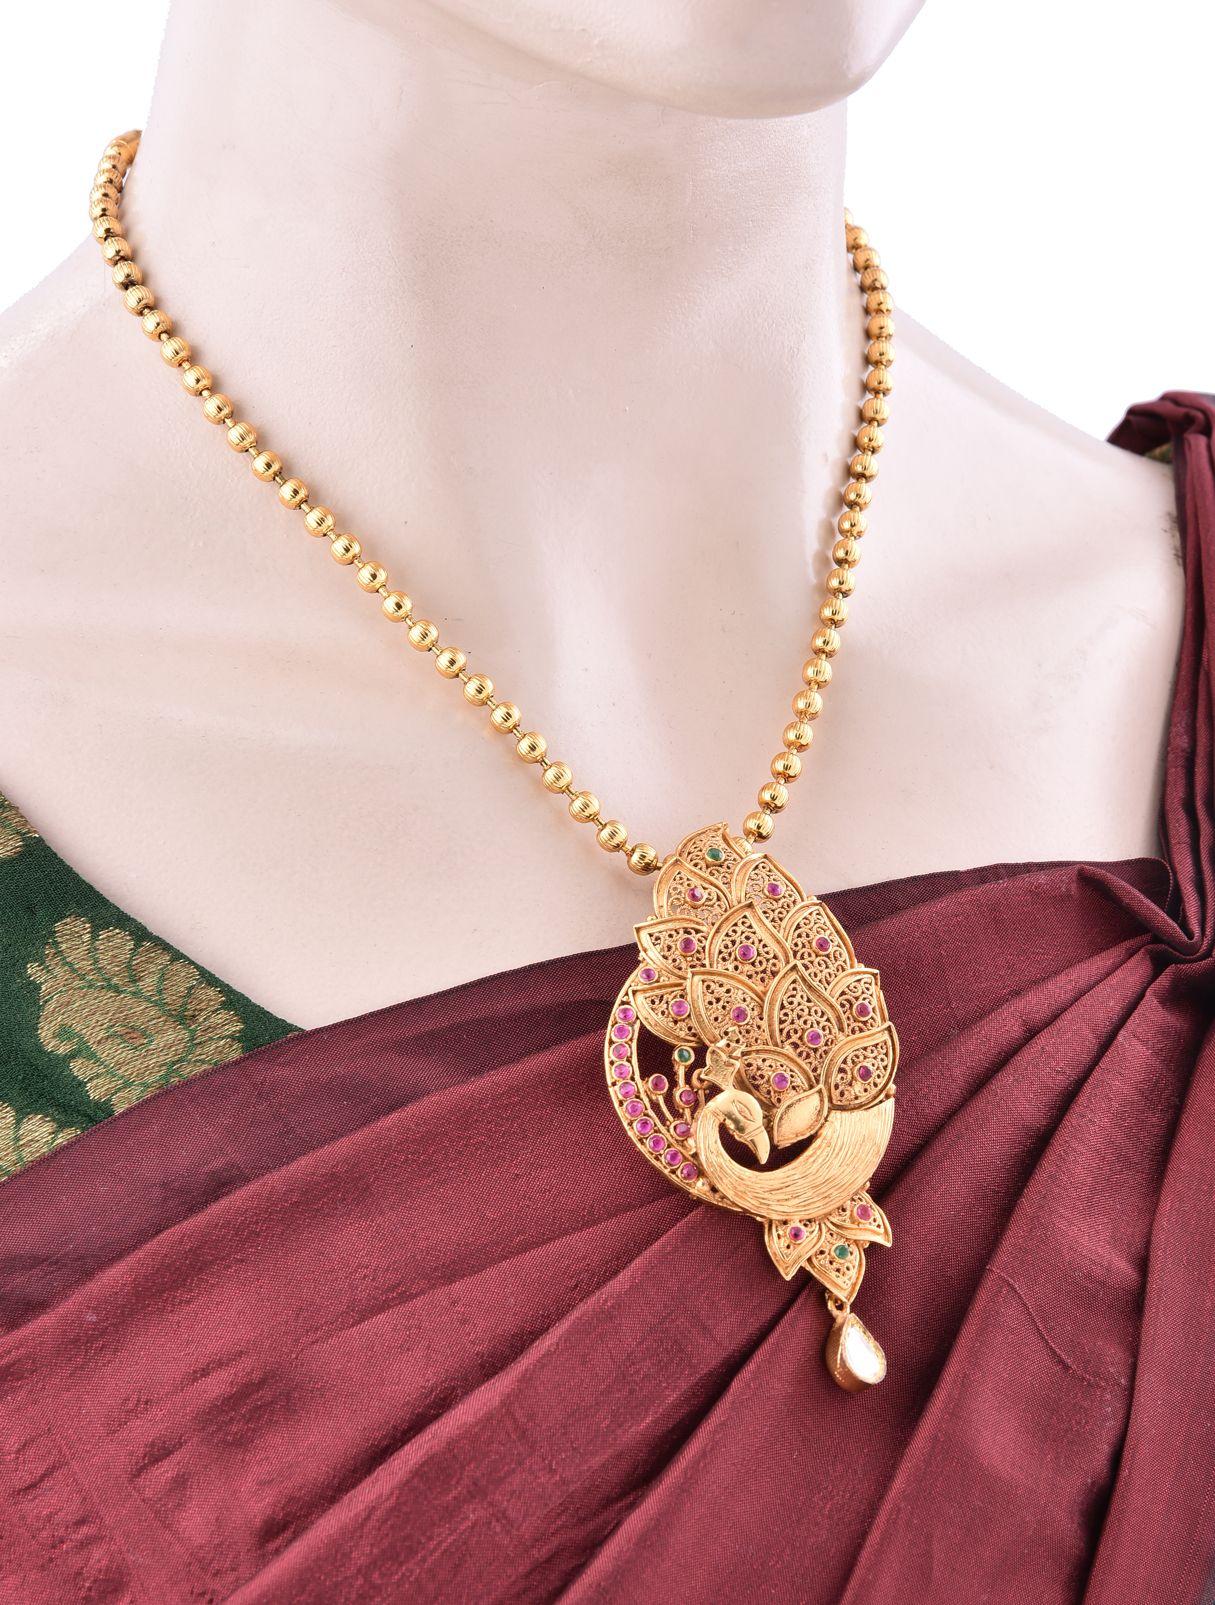 designer pendant necklace # 2